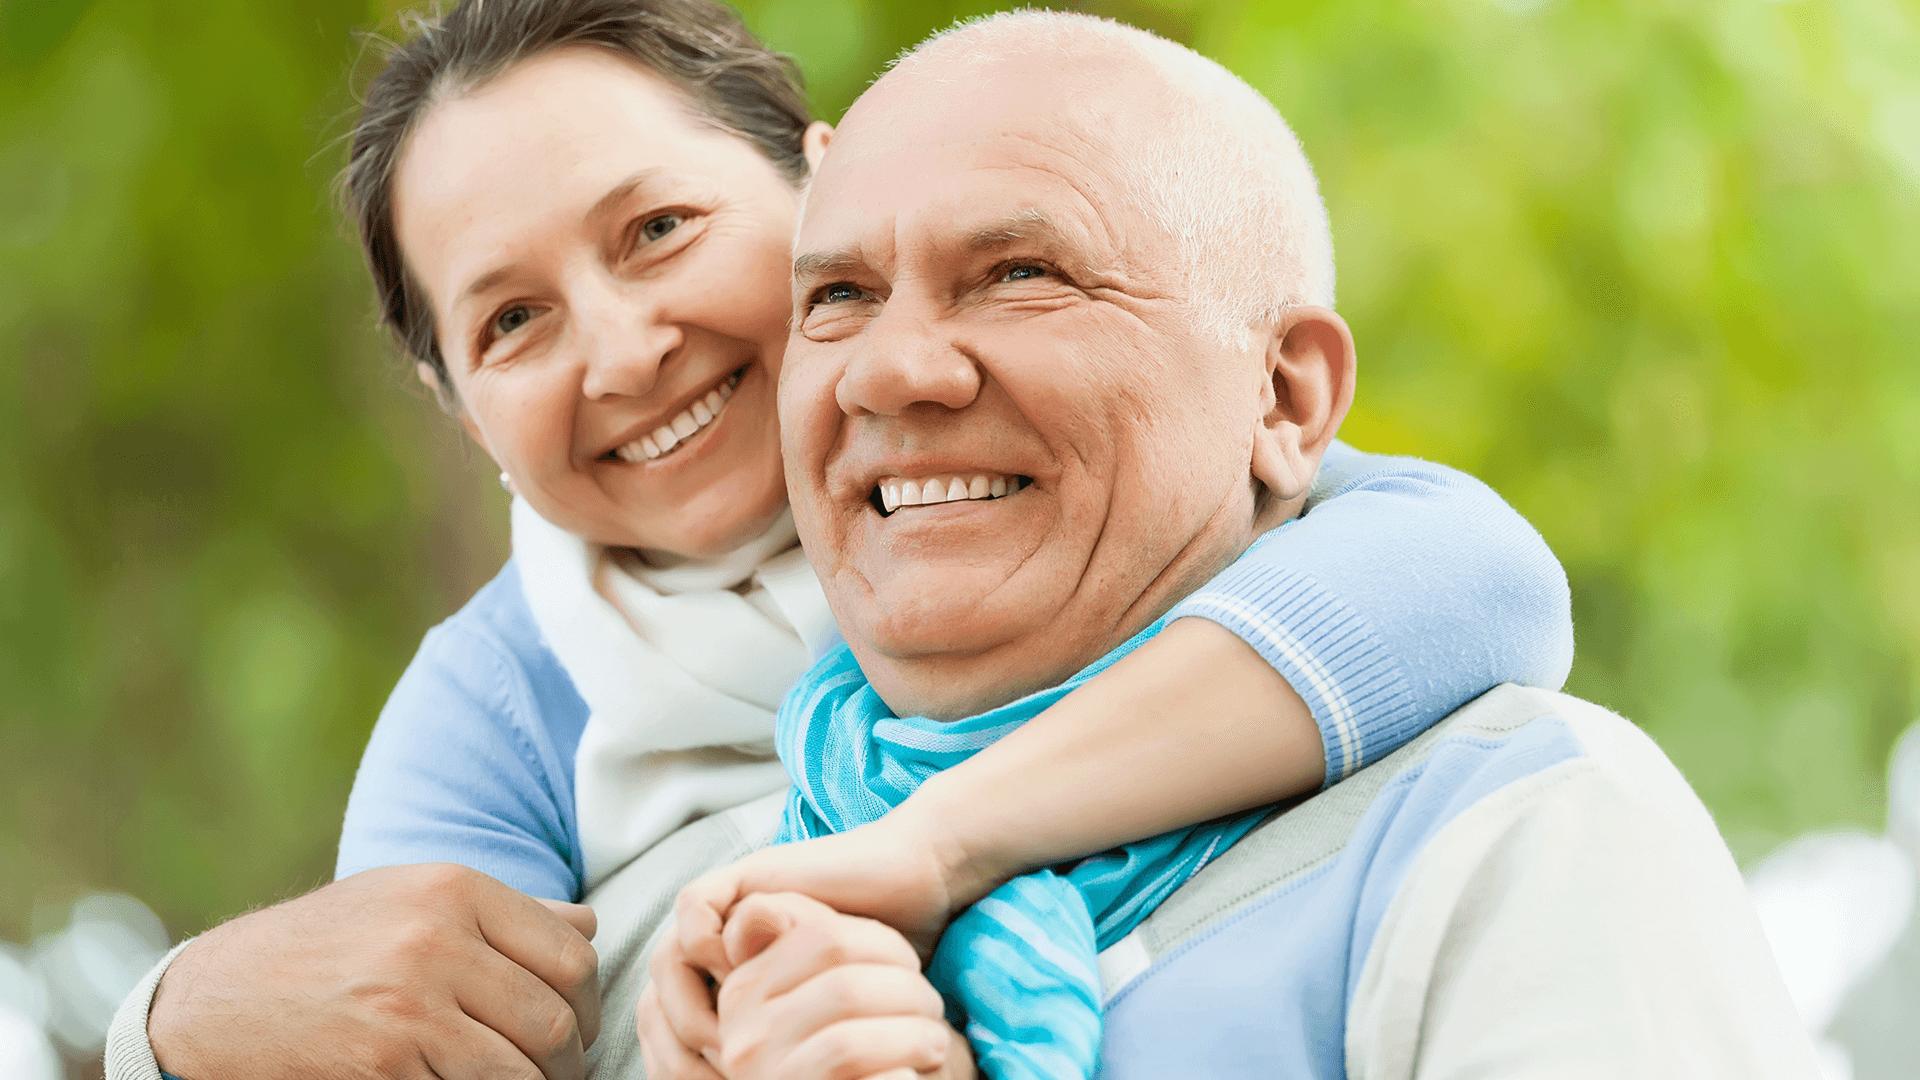 implantop-implante-idosos